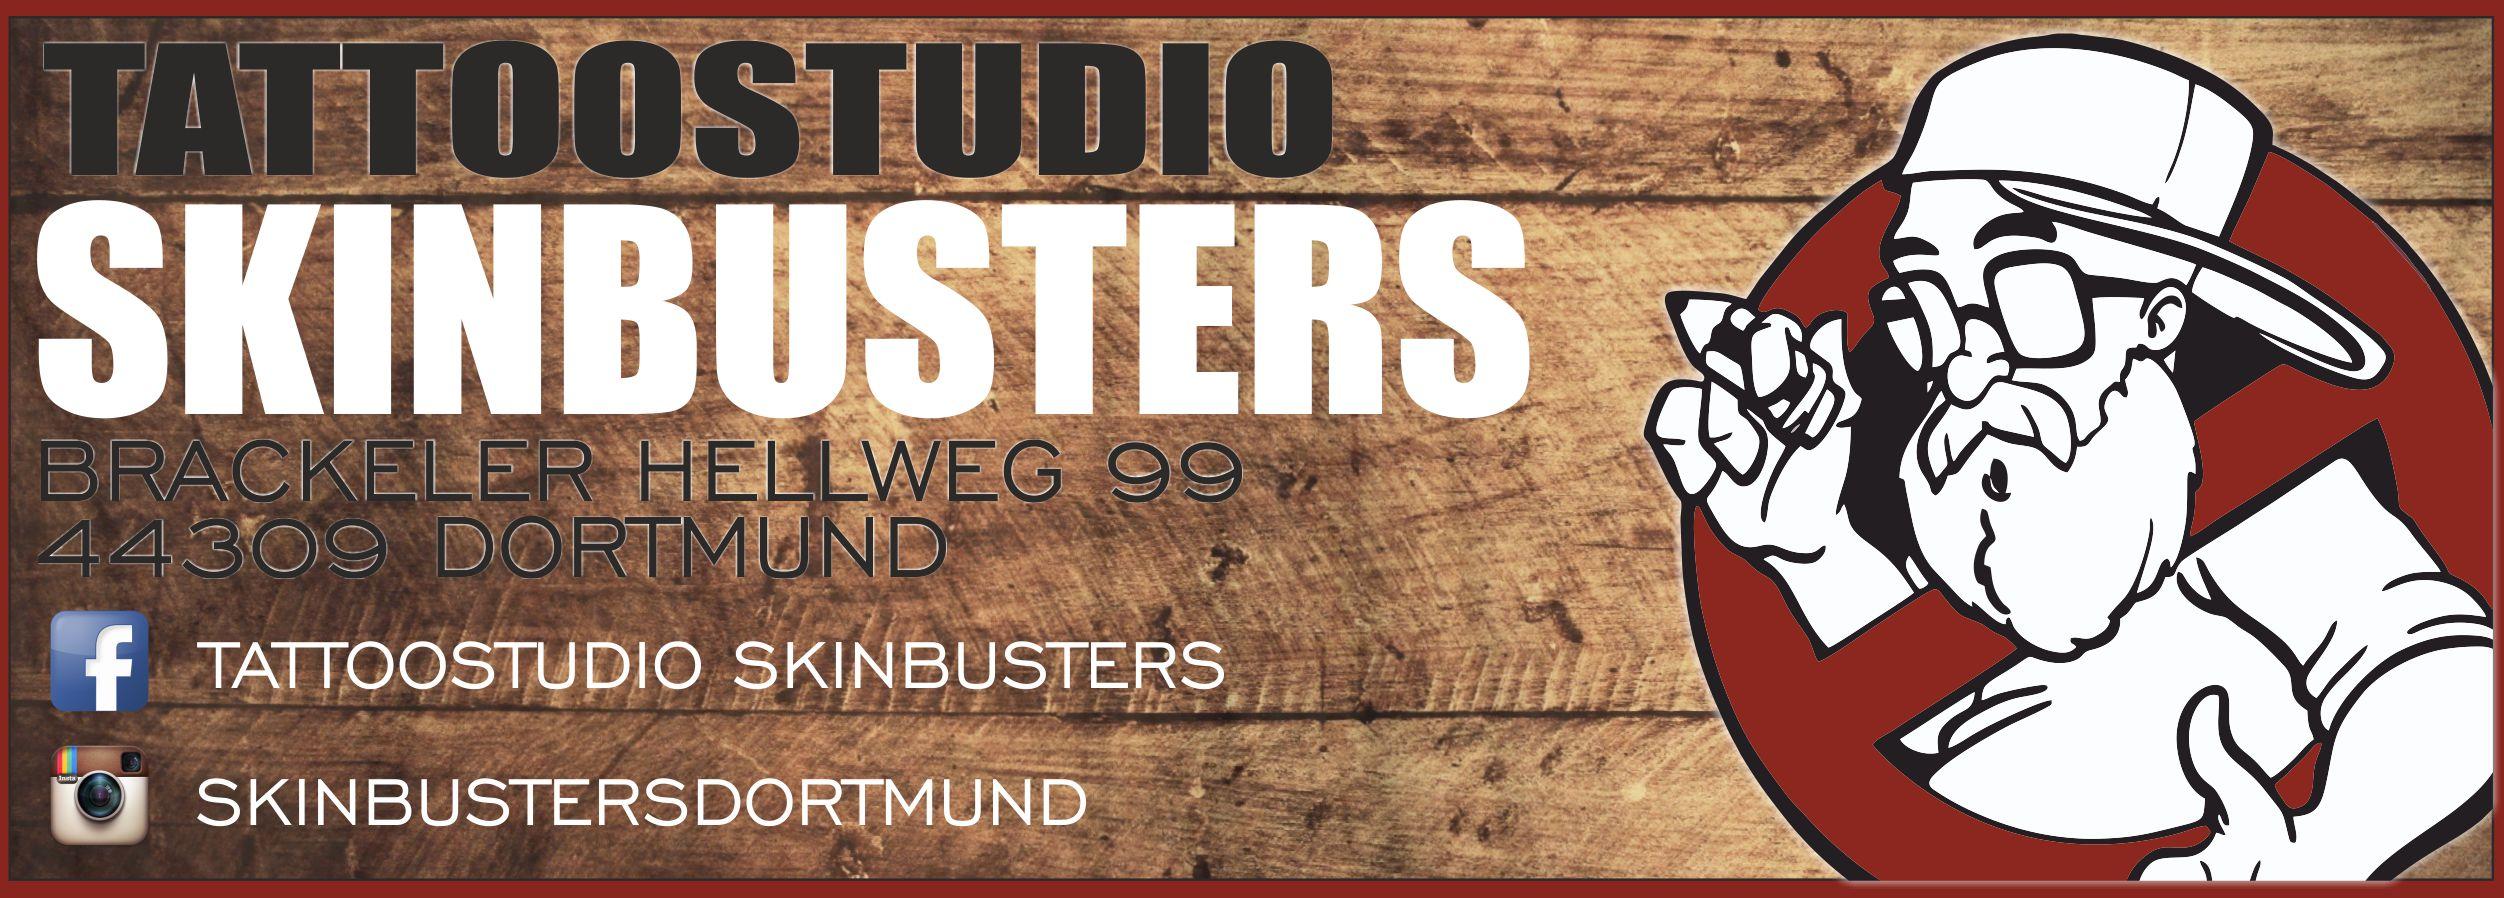 Dortmund Körne Tattoo Tattoostudio Skinbusters Paddy Unique - Tattoo Studio Dortmund